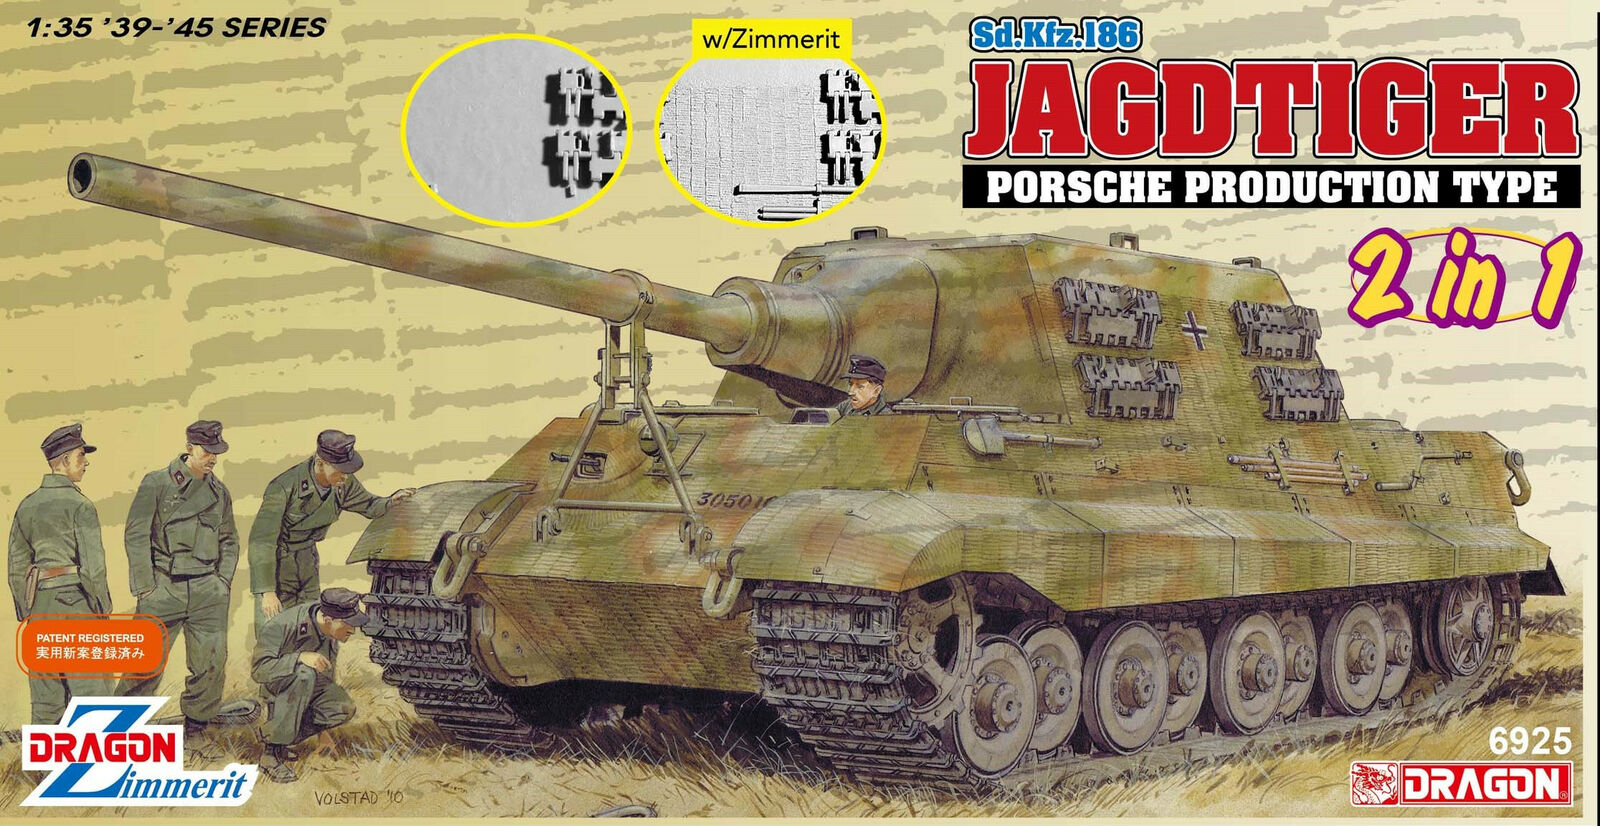 drake 6925 Sd.Kfz.186 Jagdtiger Porsche Production Type